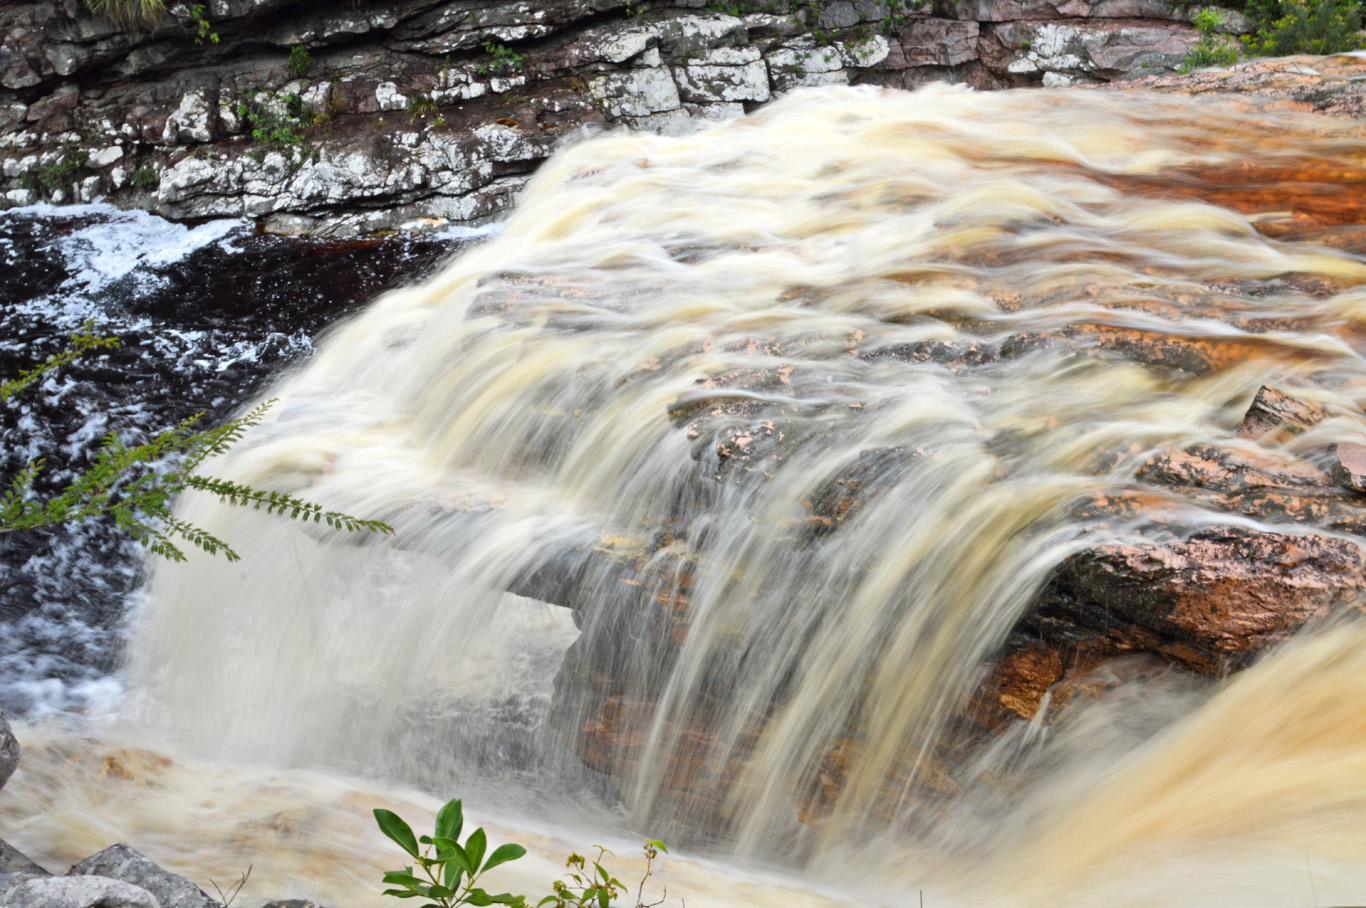 Another waterfall - cascade